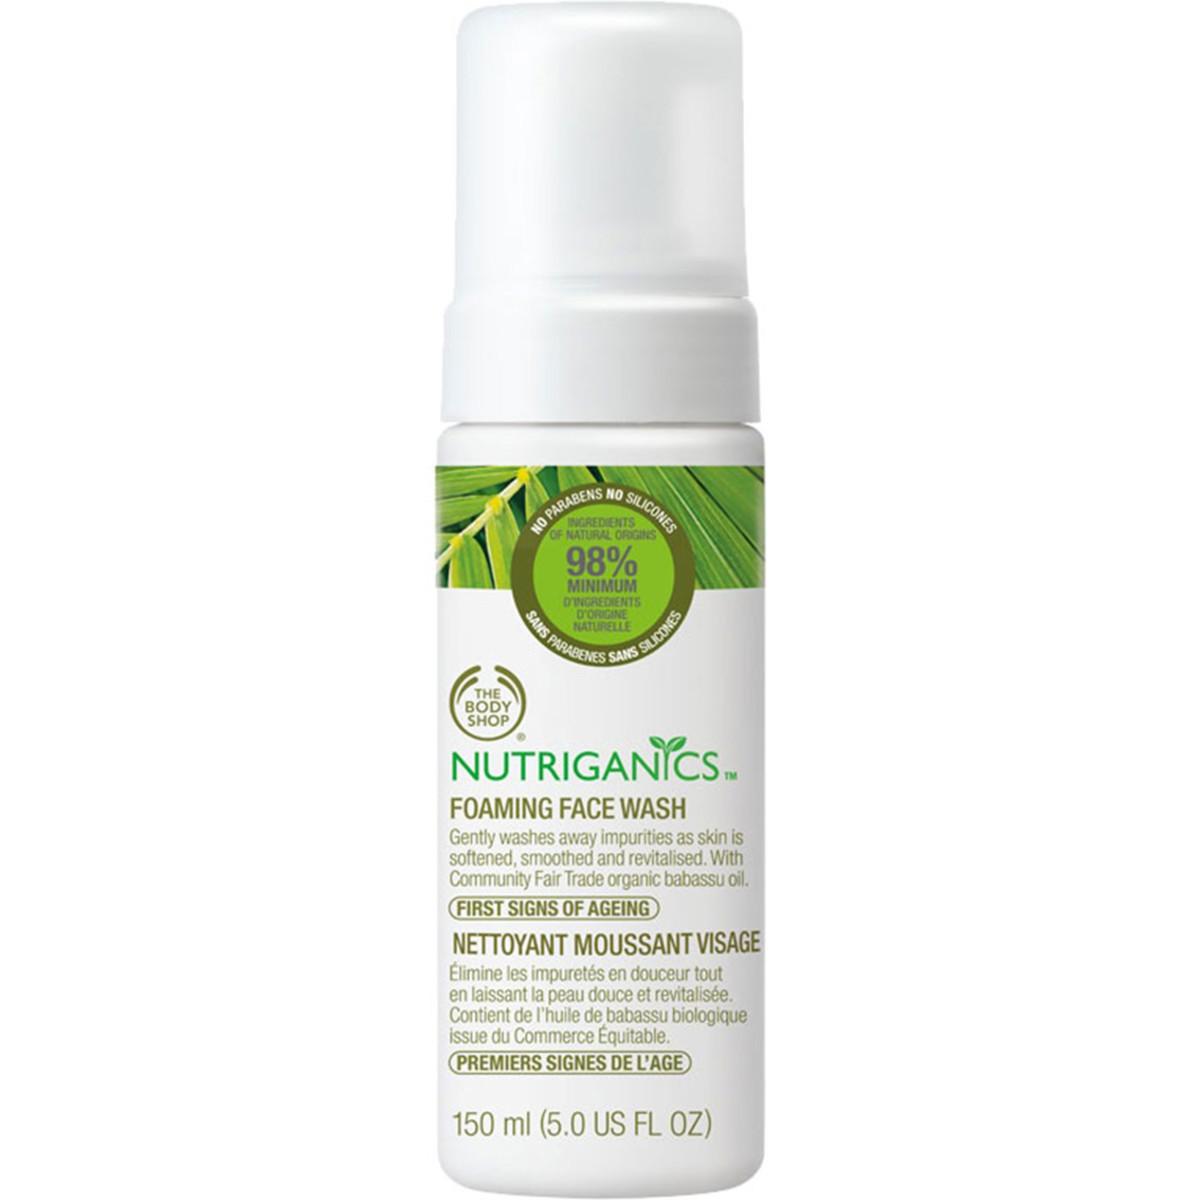 The Body Shop Nutriganics Foaming Facial Wash